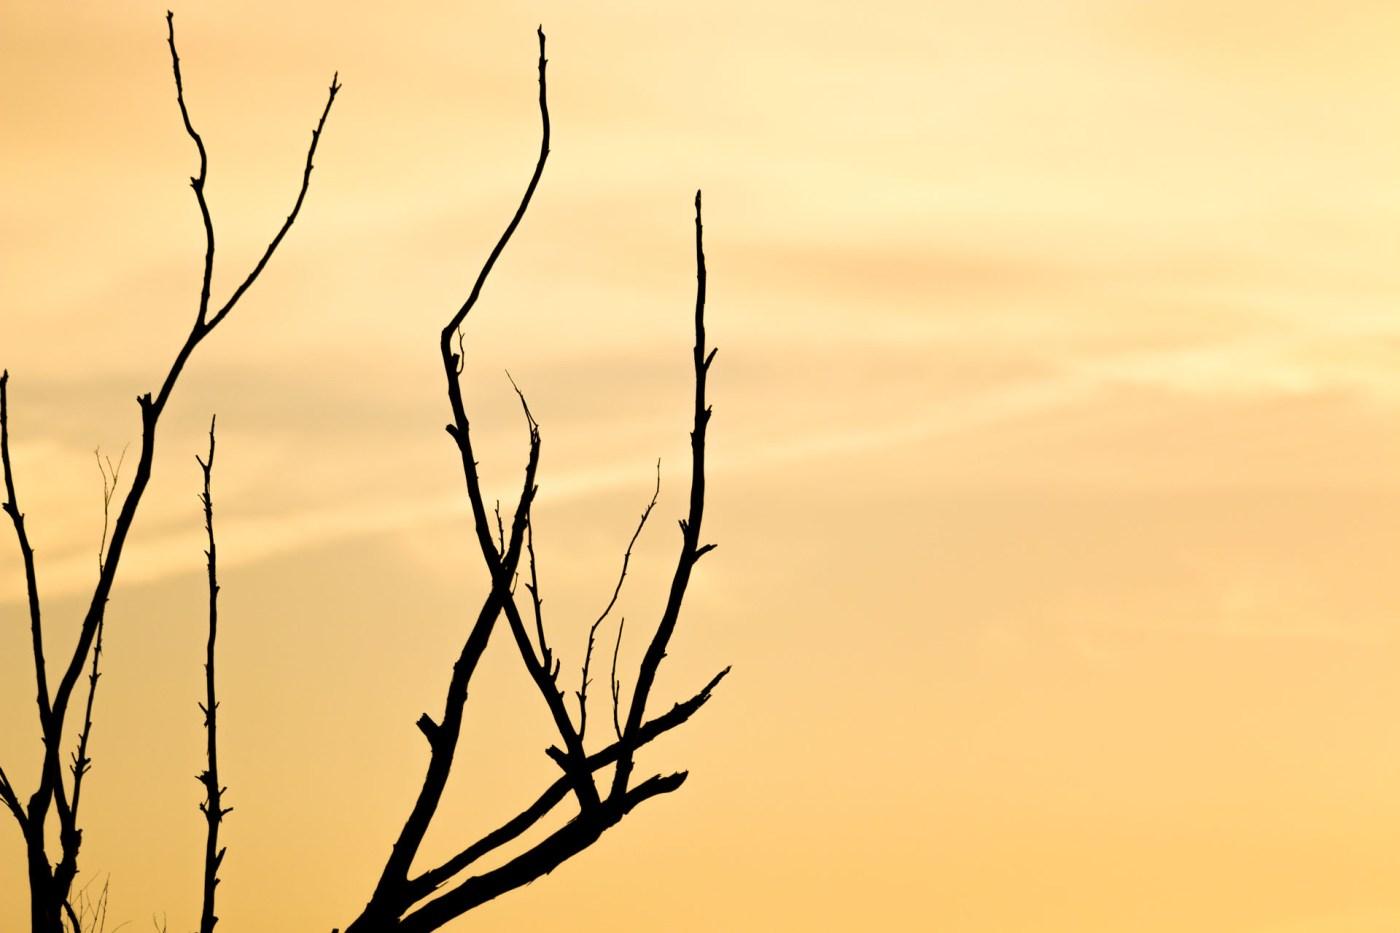 Abstract Sunset, Woolgoolga - Franzi Photography